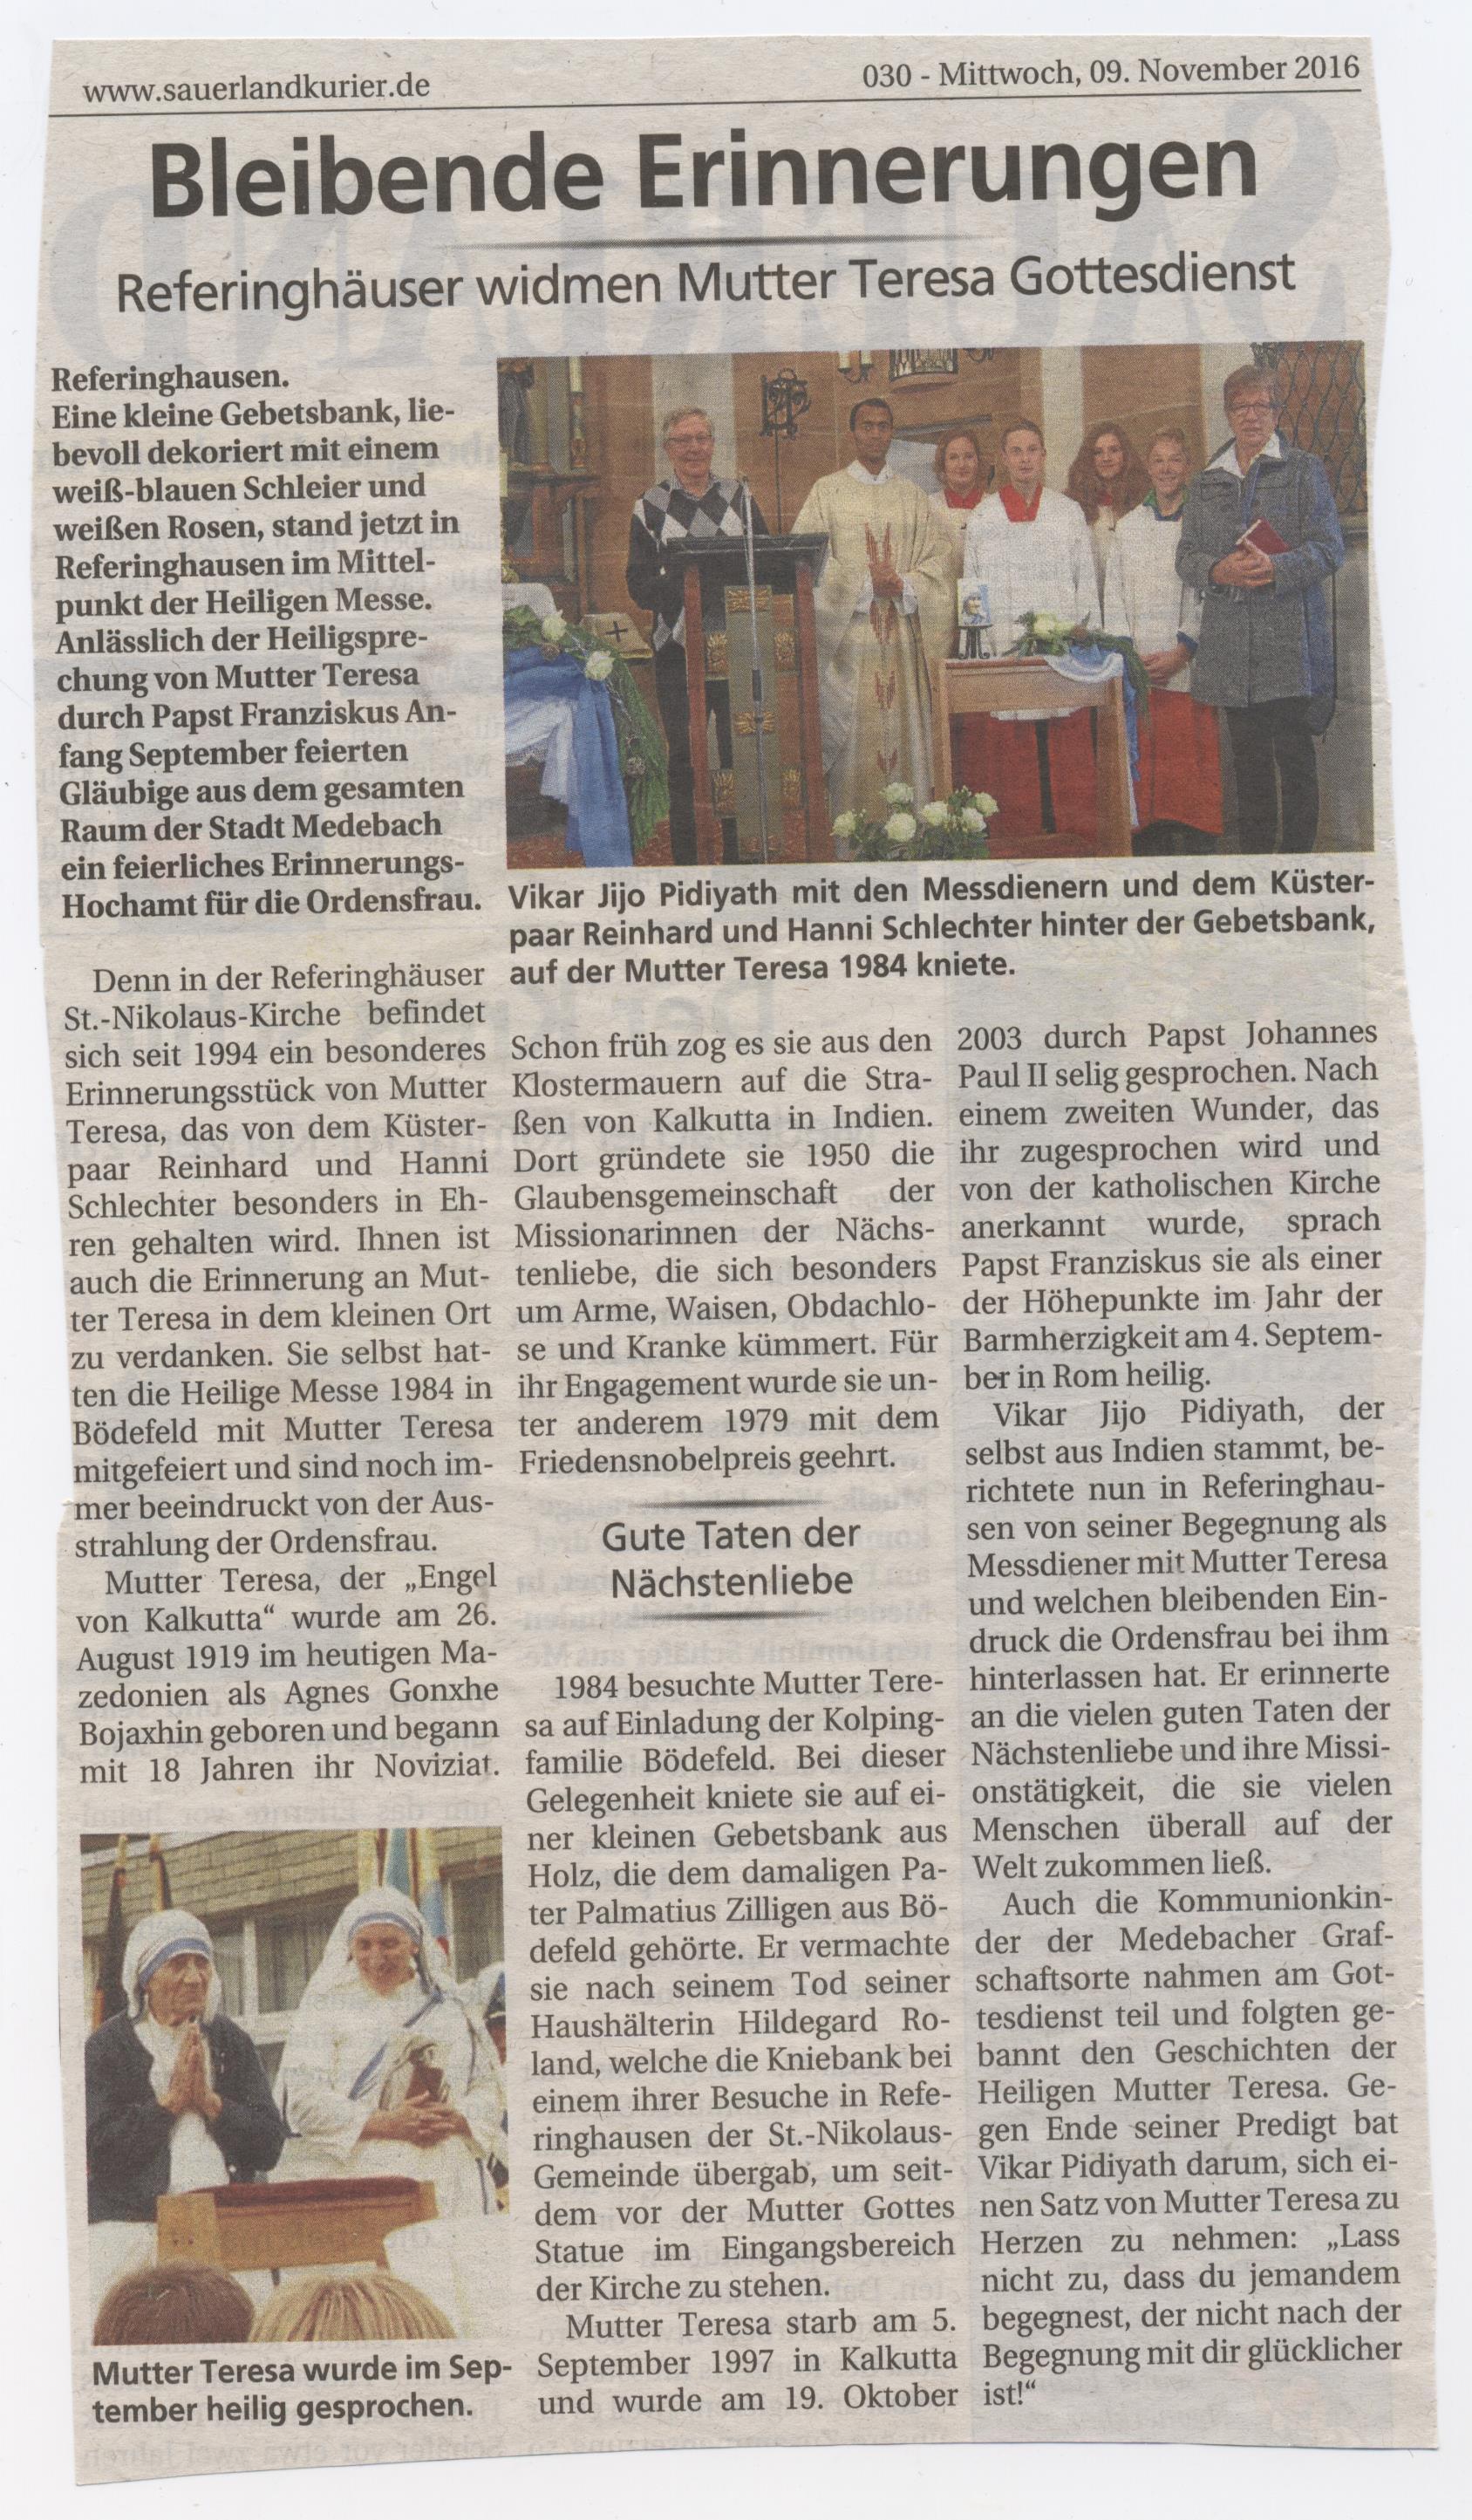 Gottesdienst in Gedenken an Mutter Teresa